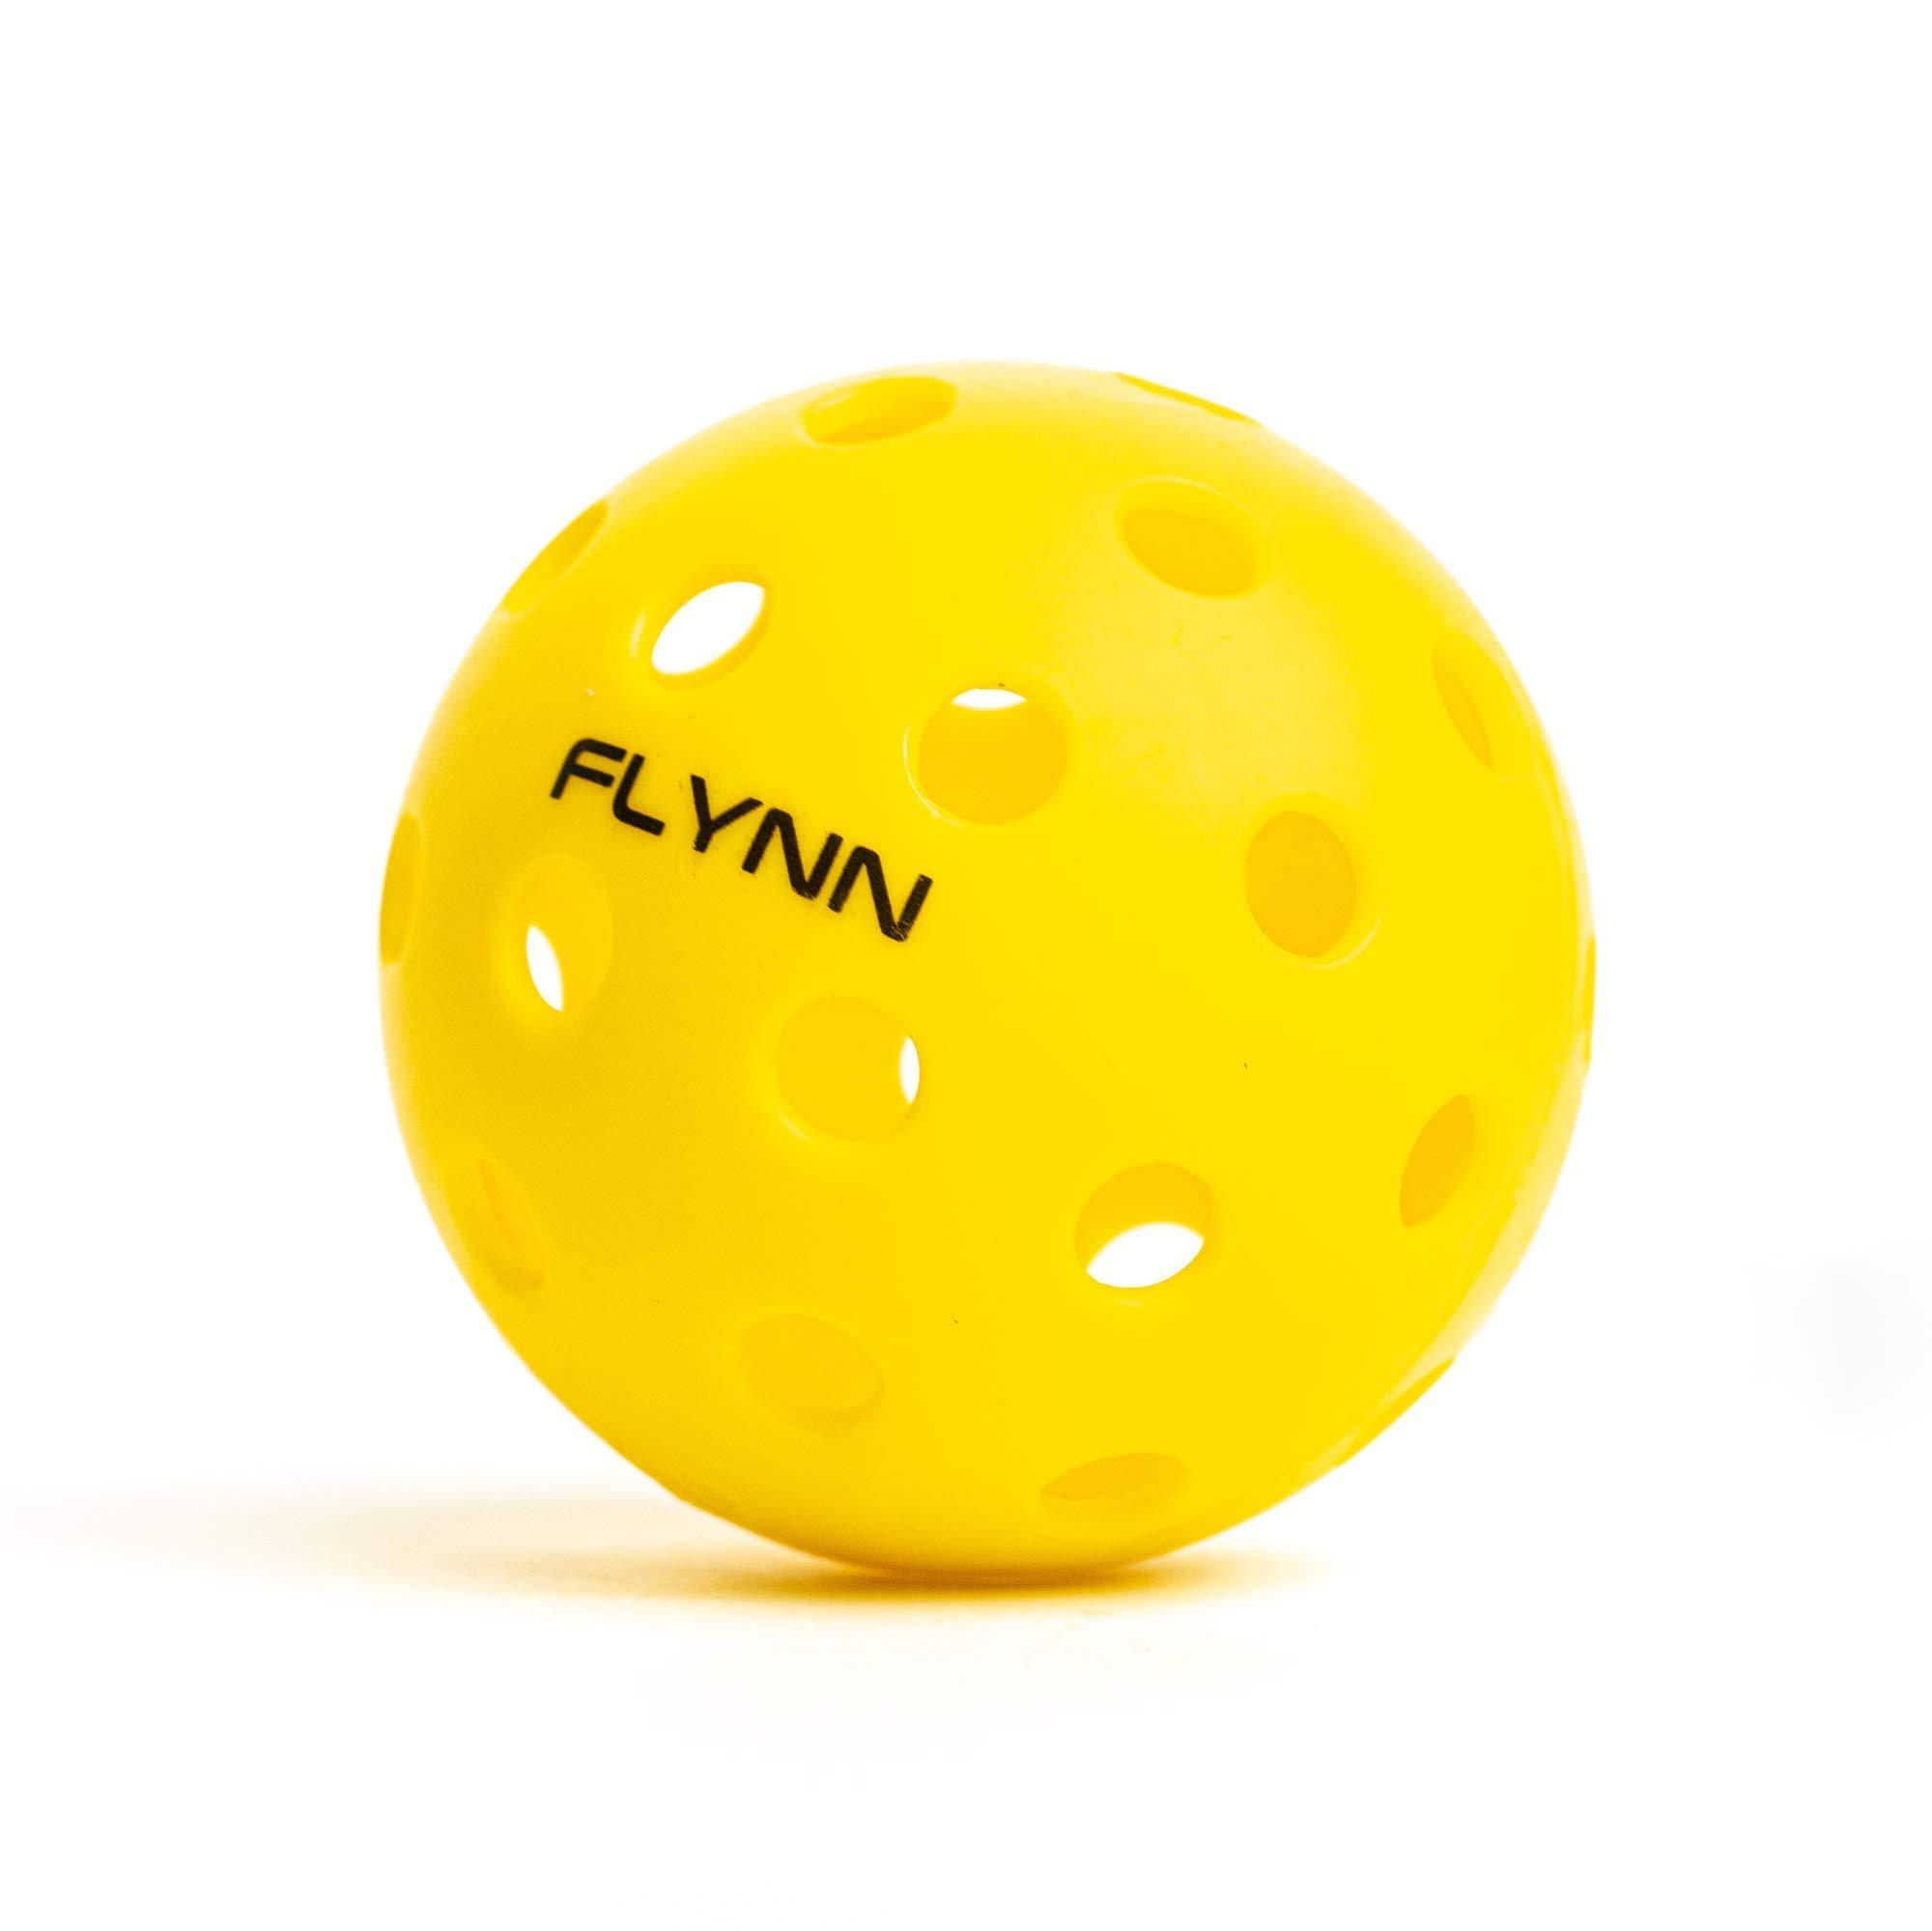 Flynn Outdoor Pickleball Balls Bright Yellow Pickle Balls 6